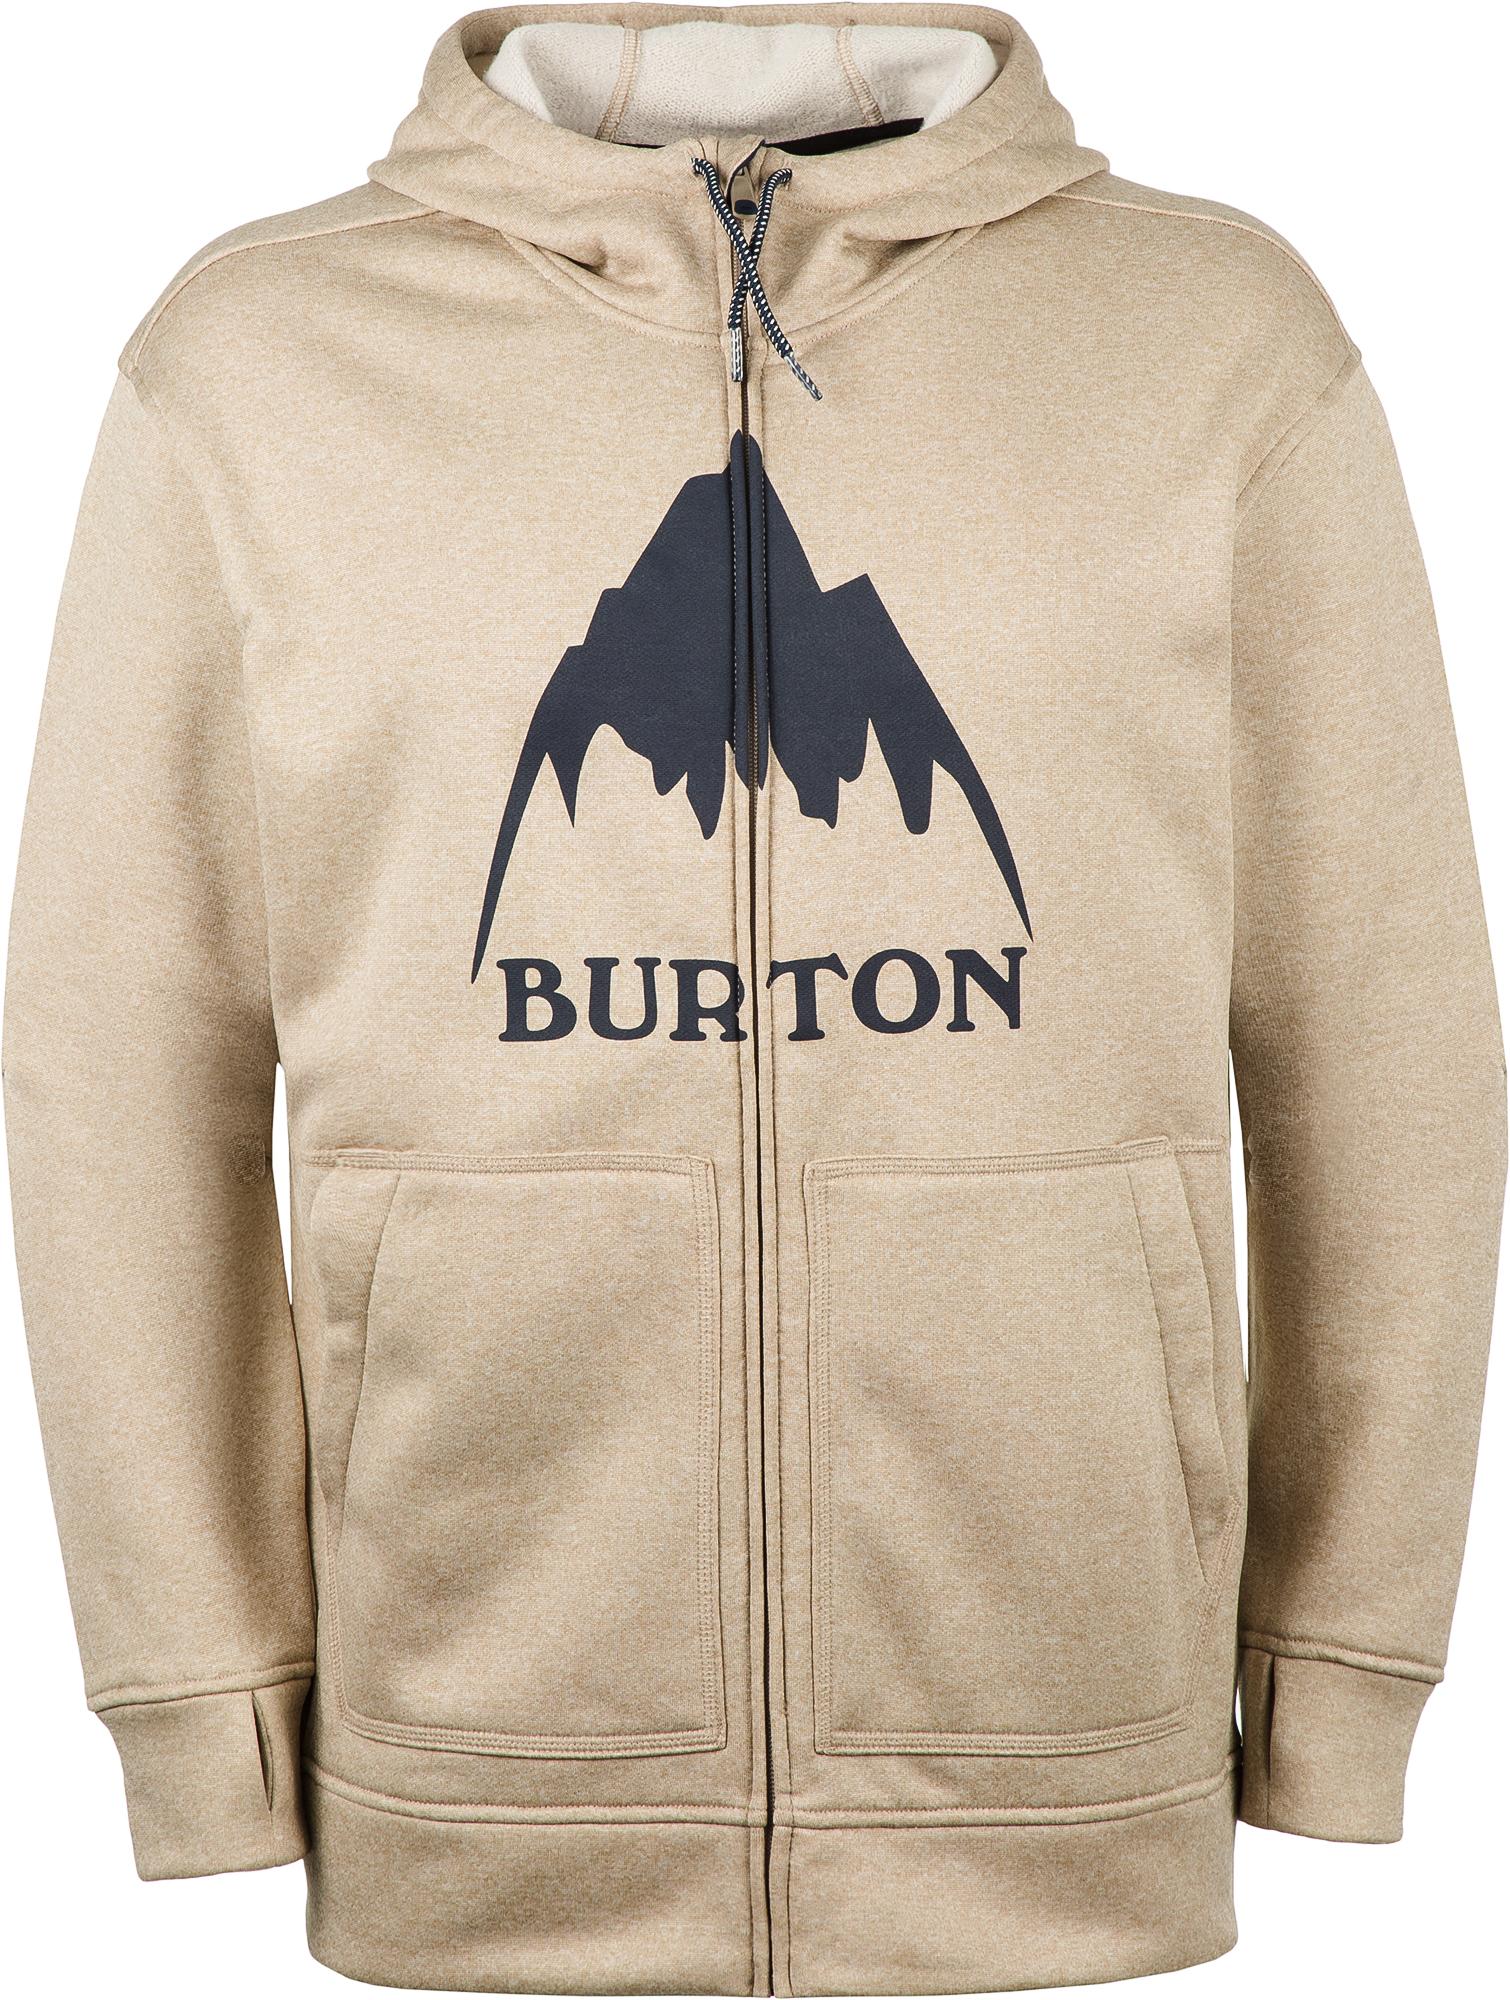 Burton Толстовка мужская Burton Oak, размер 52-54 цена и фото